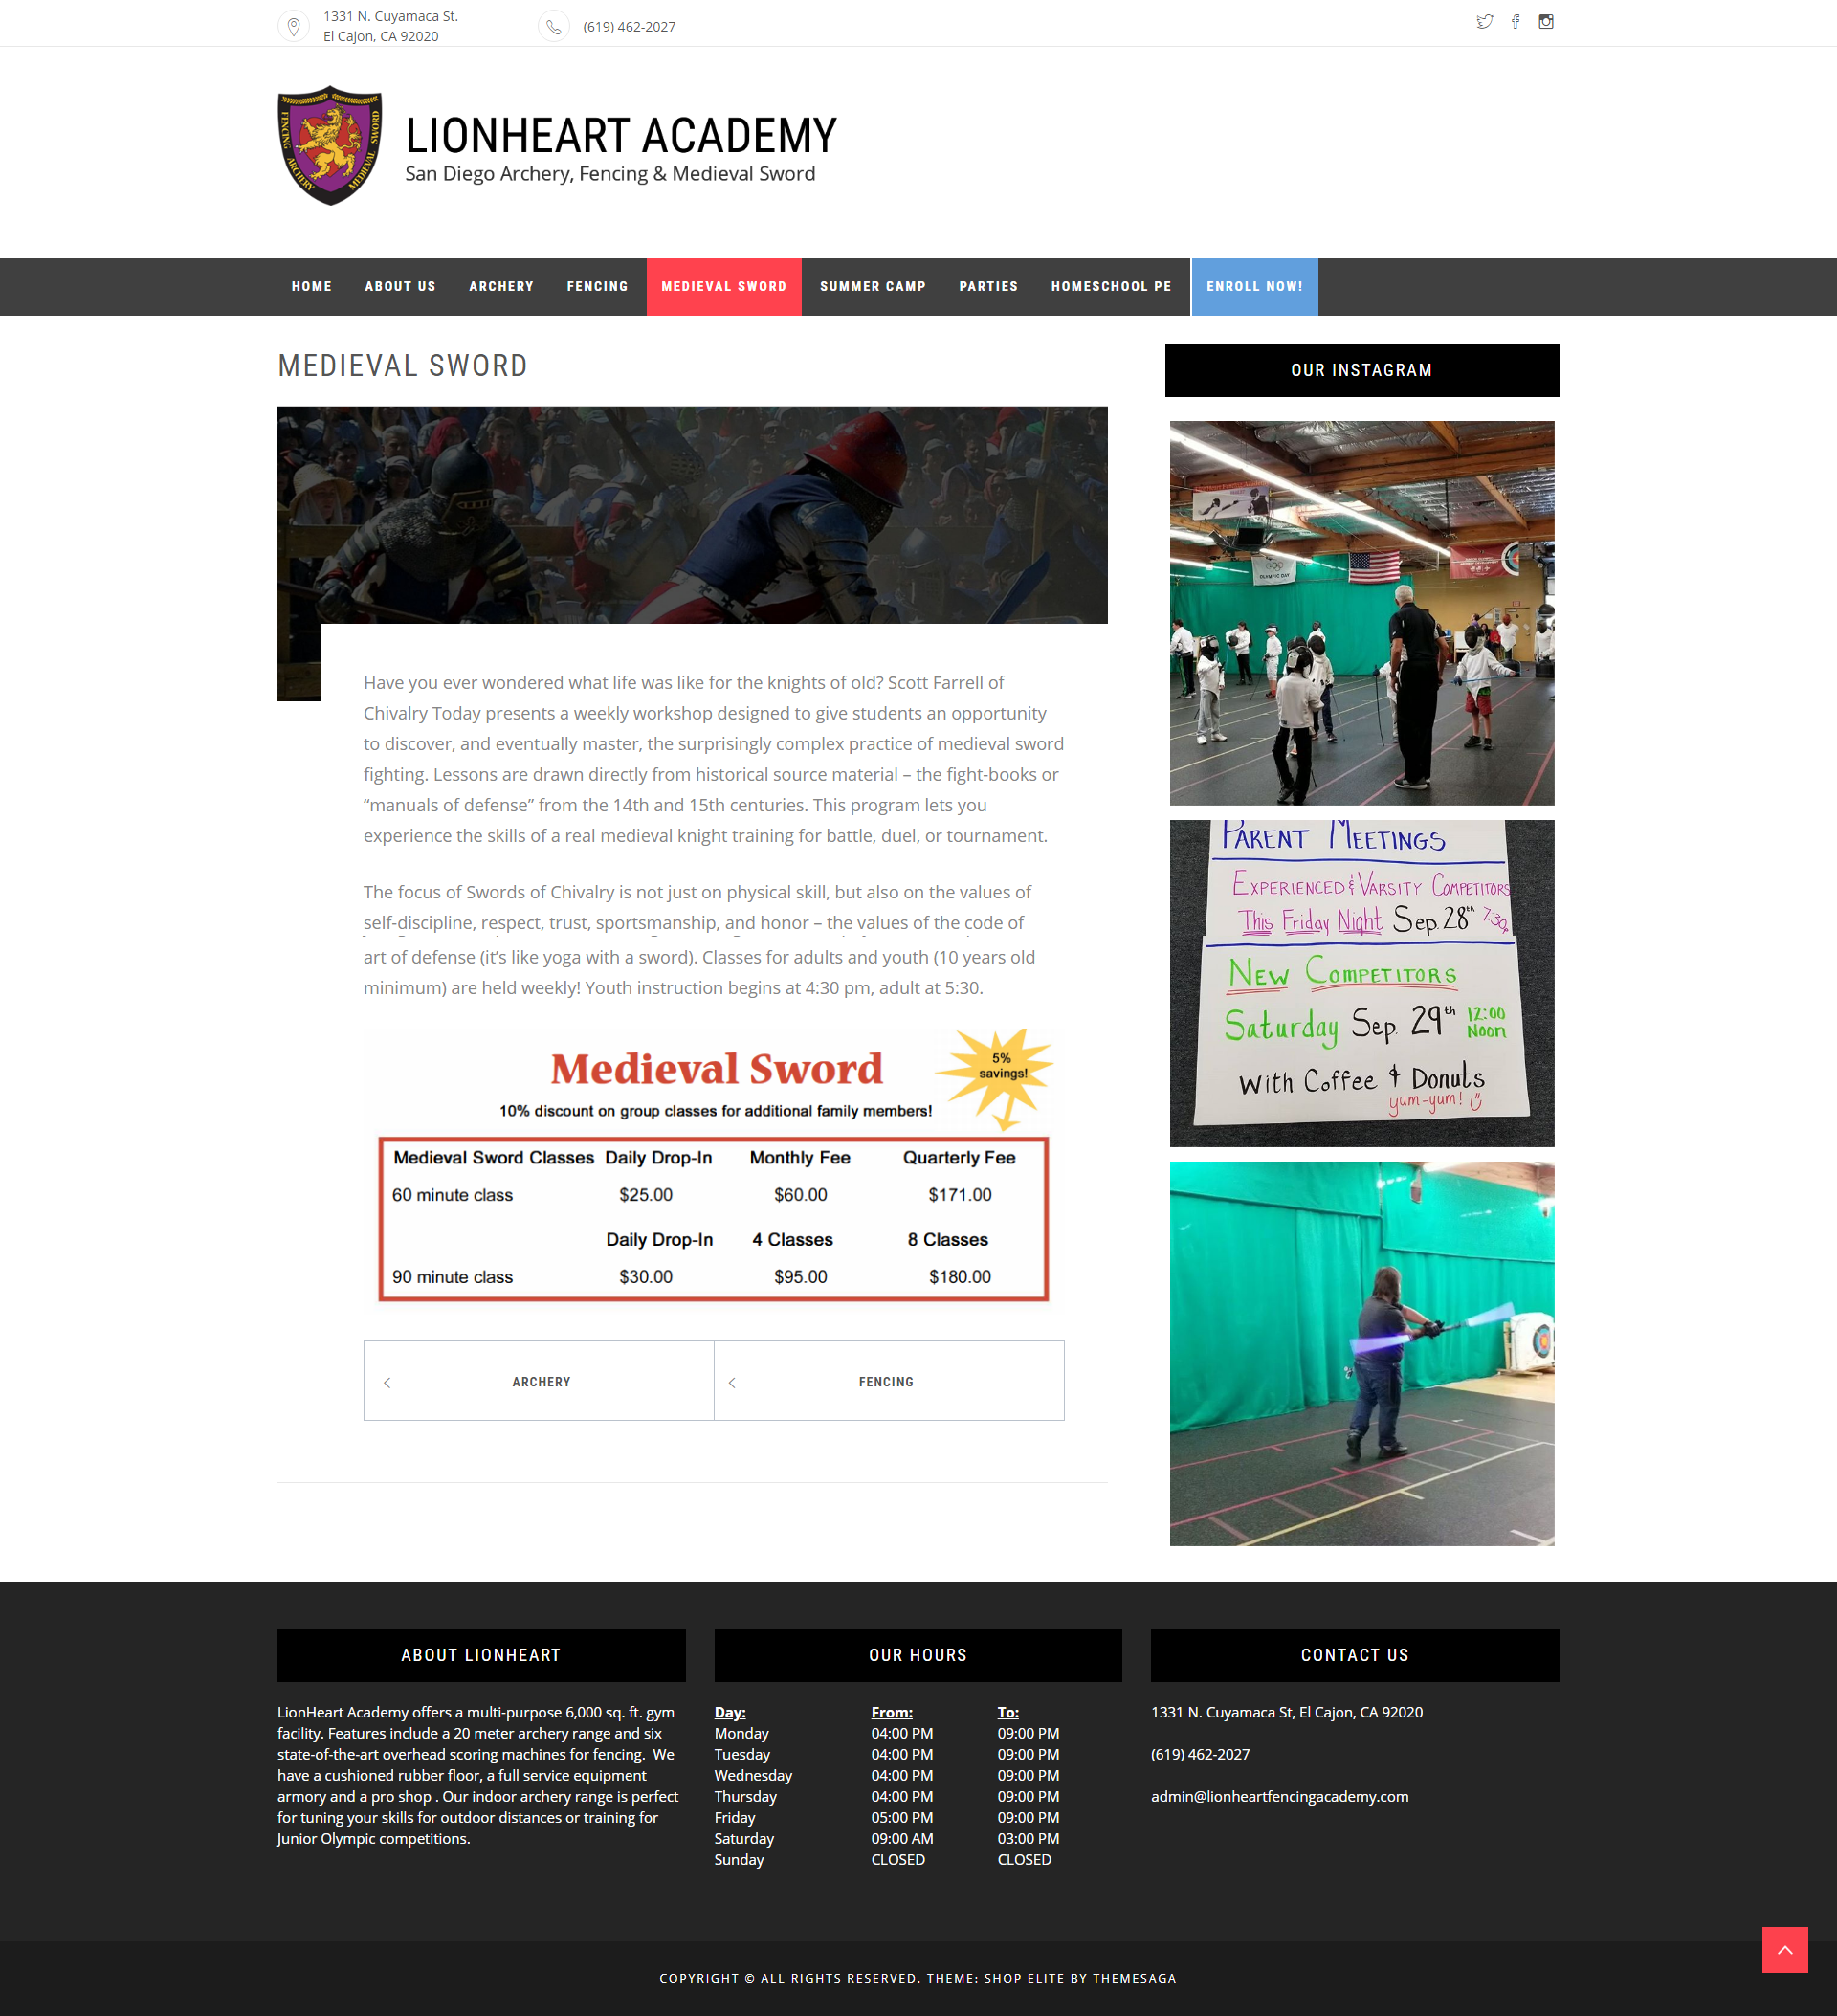 Lionheart Academy Preview 2